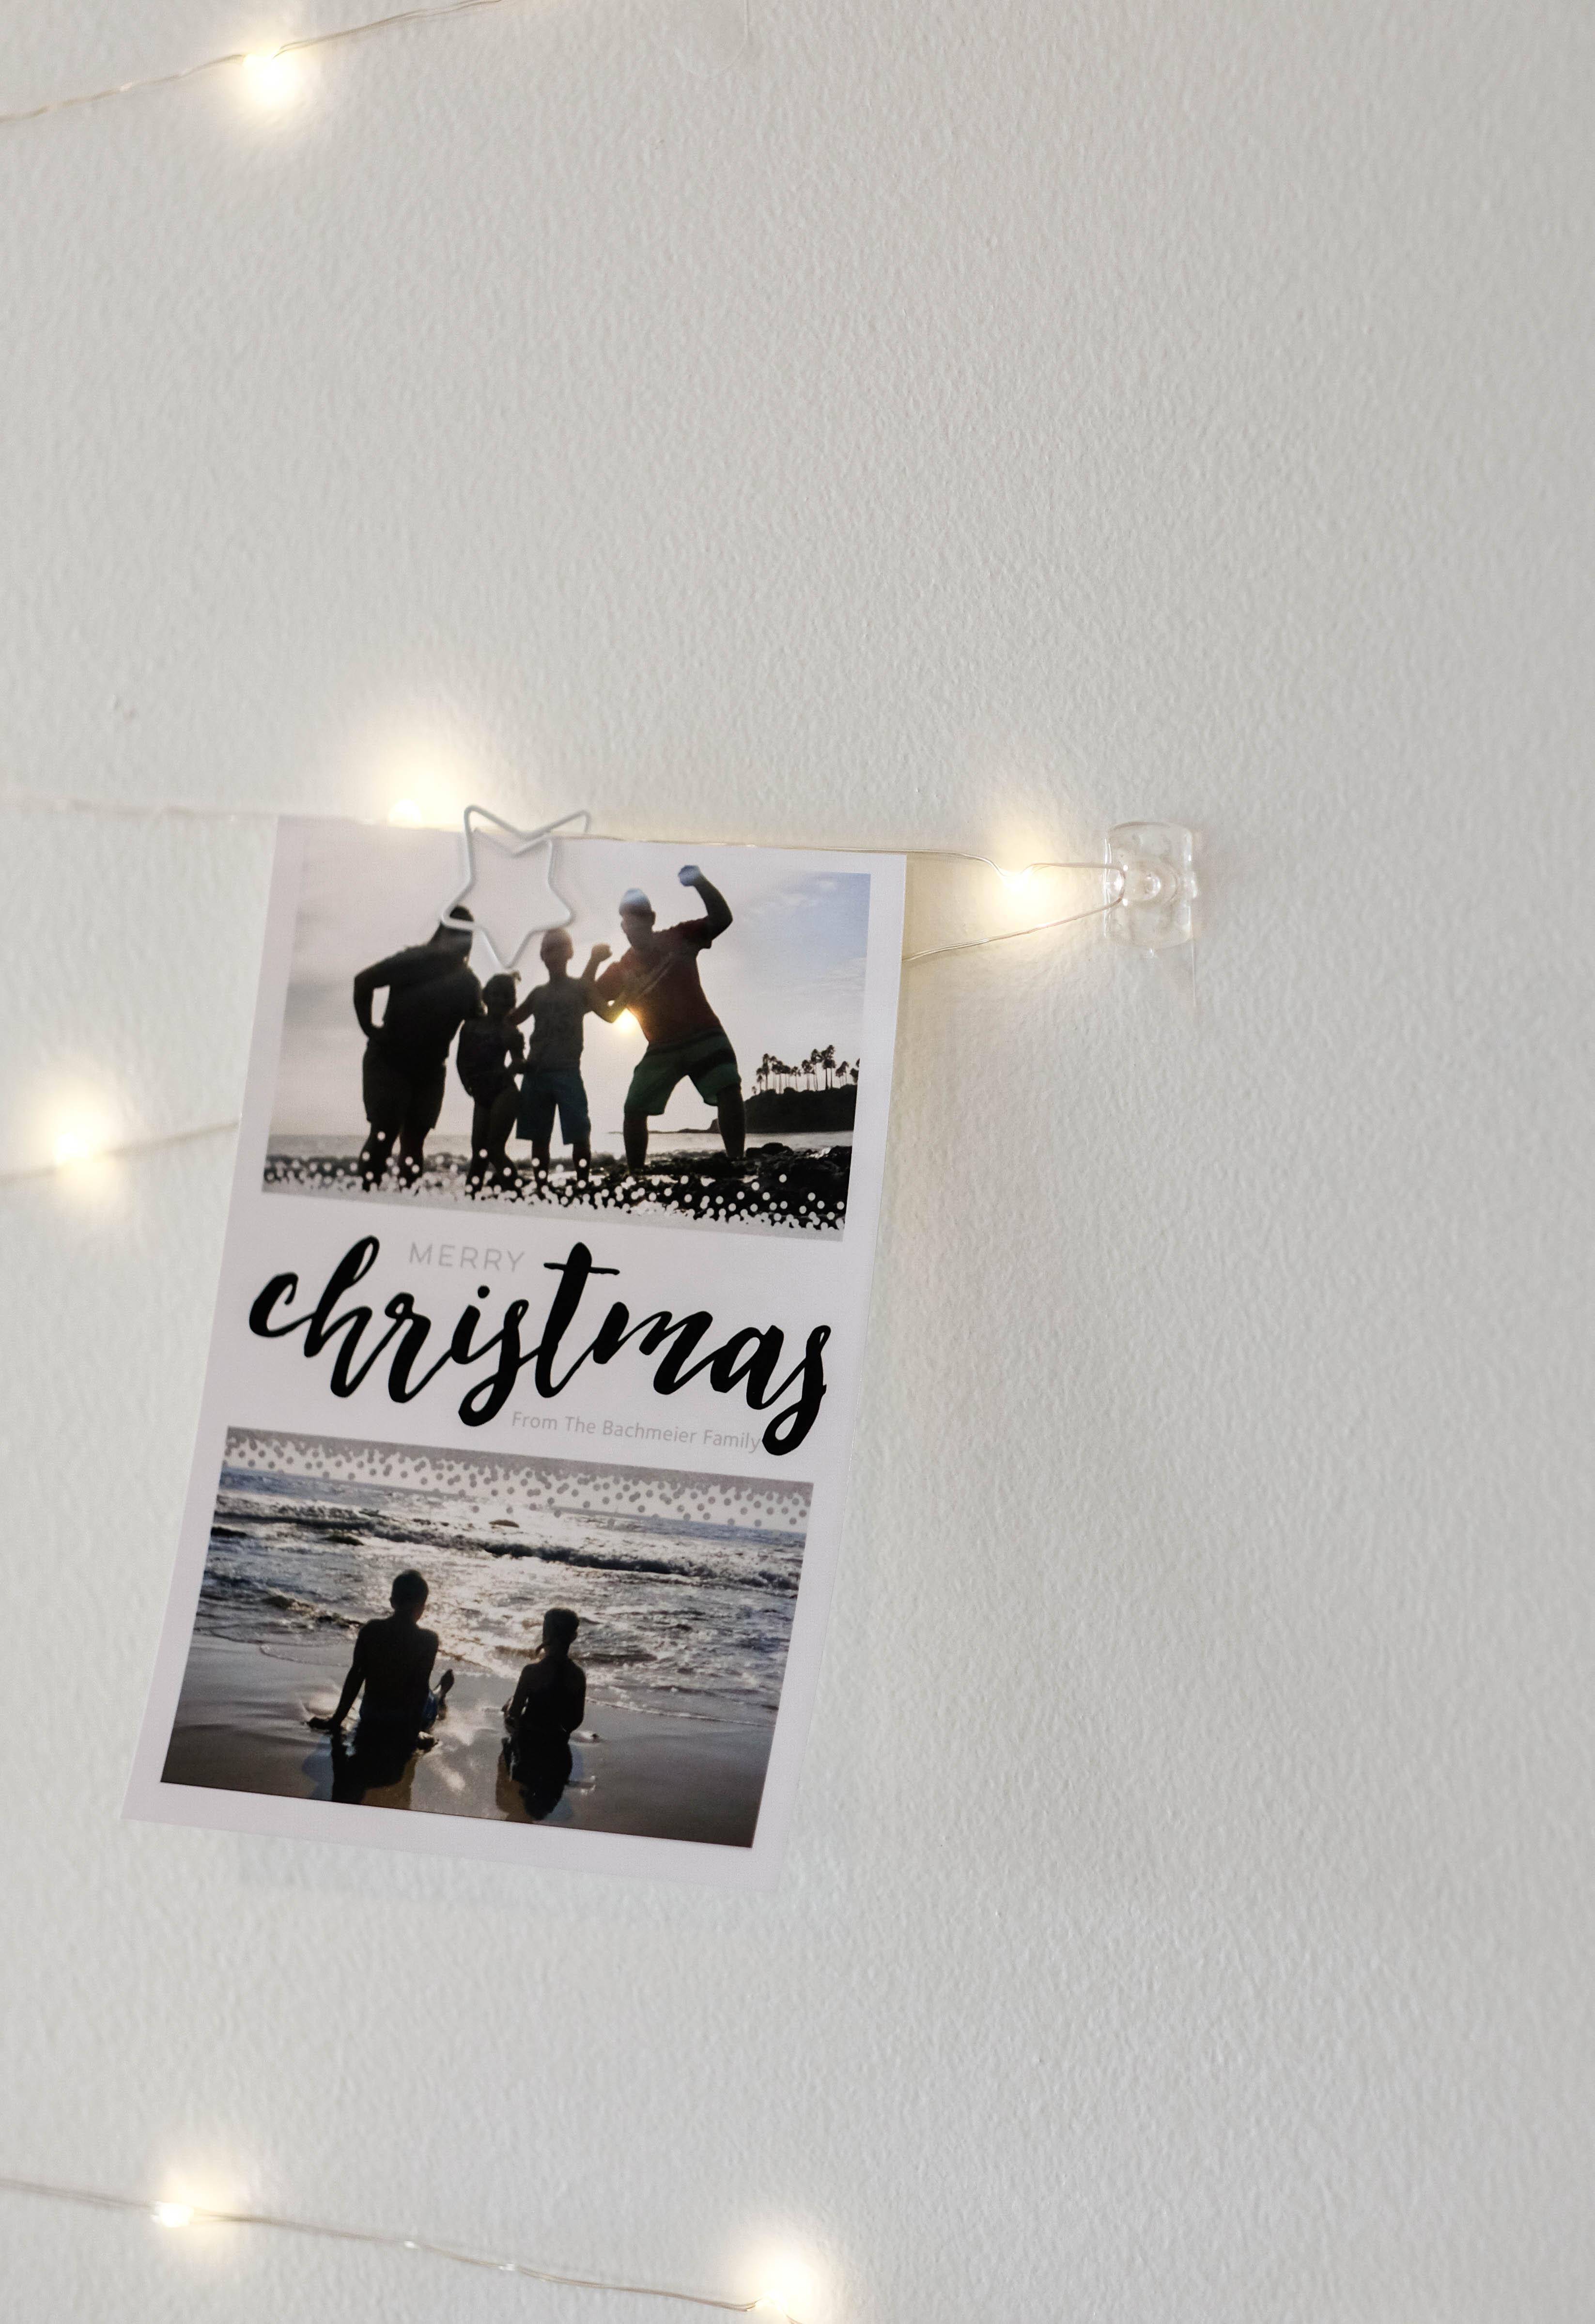 Simple Christmas Decor Ideas - Twinkle Light Card Display